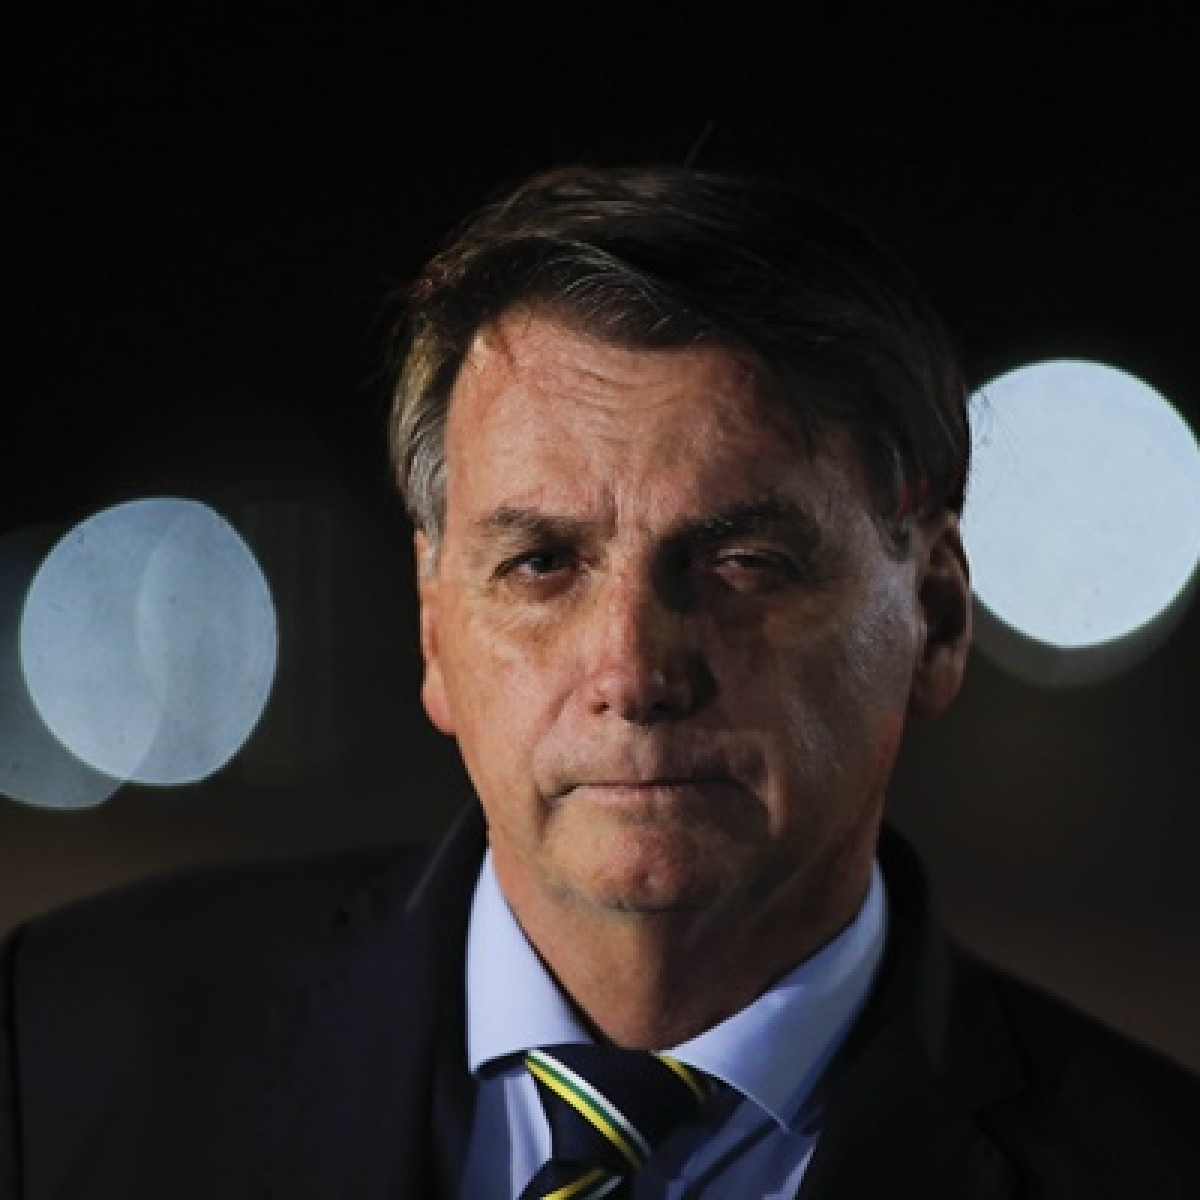 Brazilian President Jair Bolsonaro sacks health minister after dispute over COVID-19 response